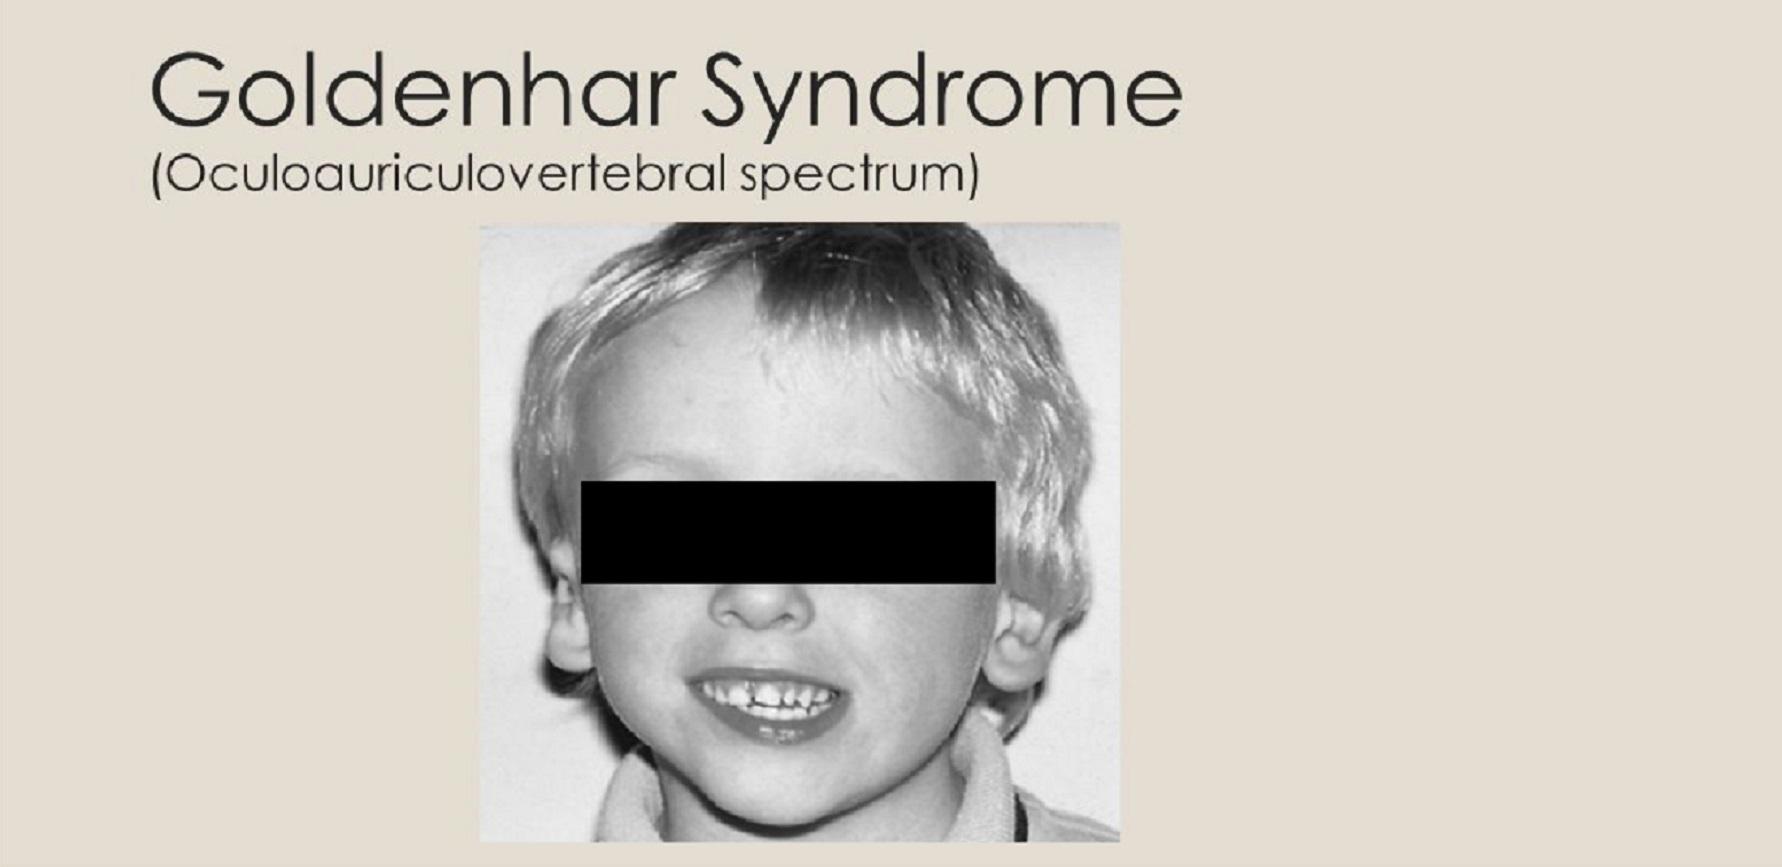 Goldenhar syndrome